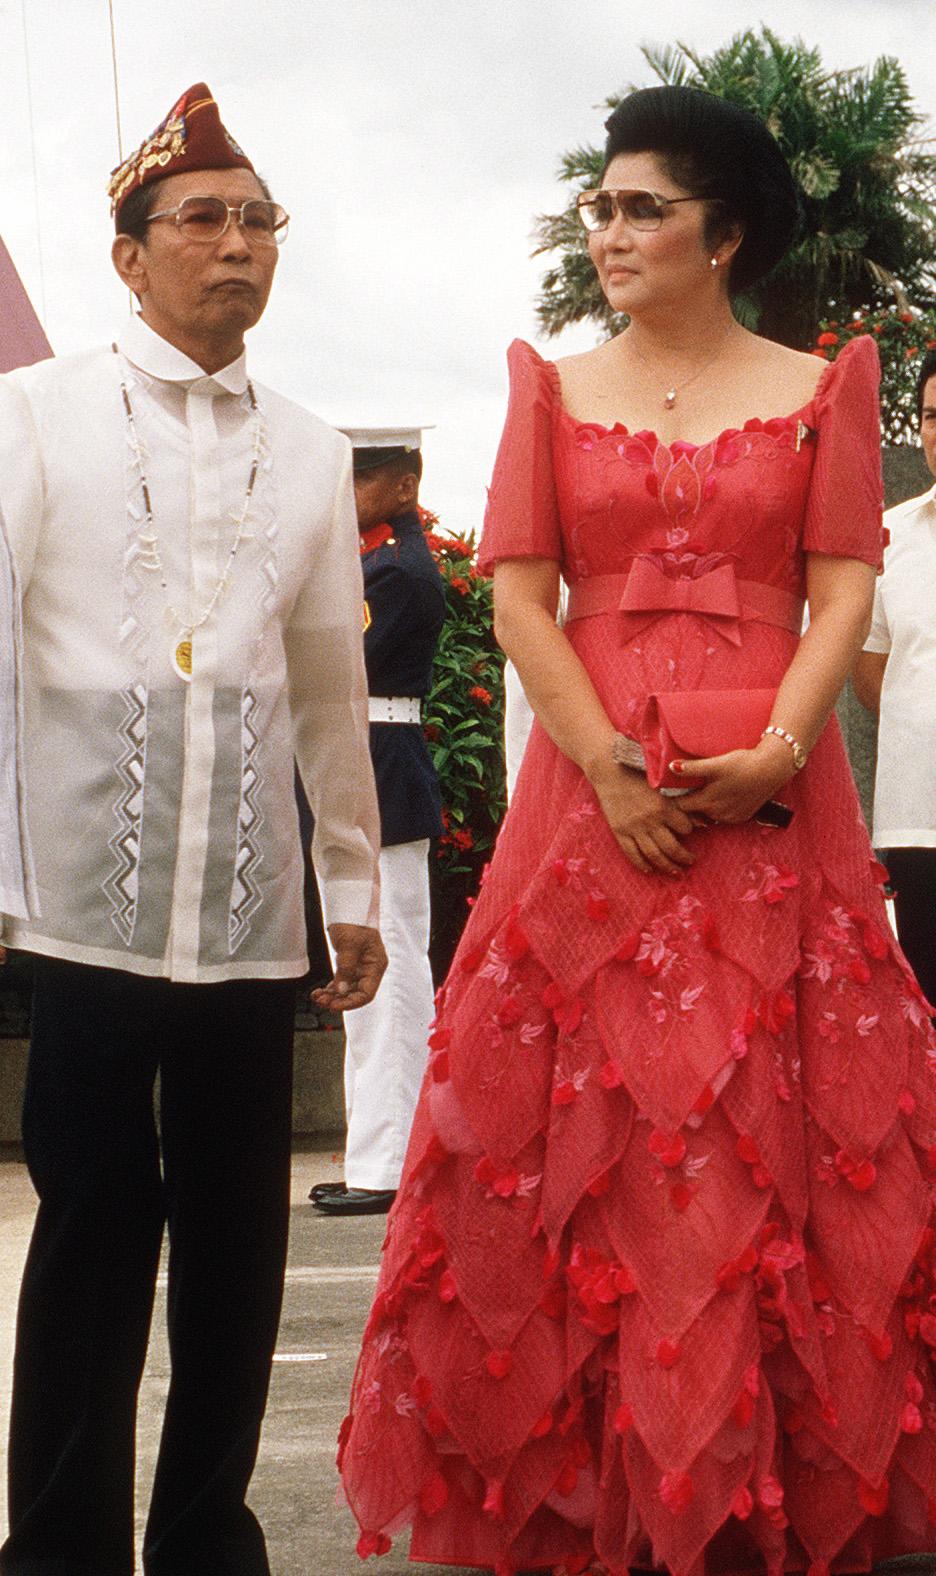 Traditional Filipino Clothing | www.imgkid.com - The Image ...